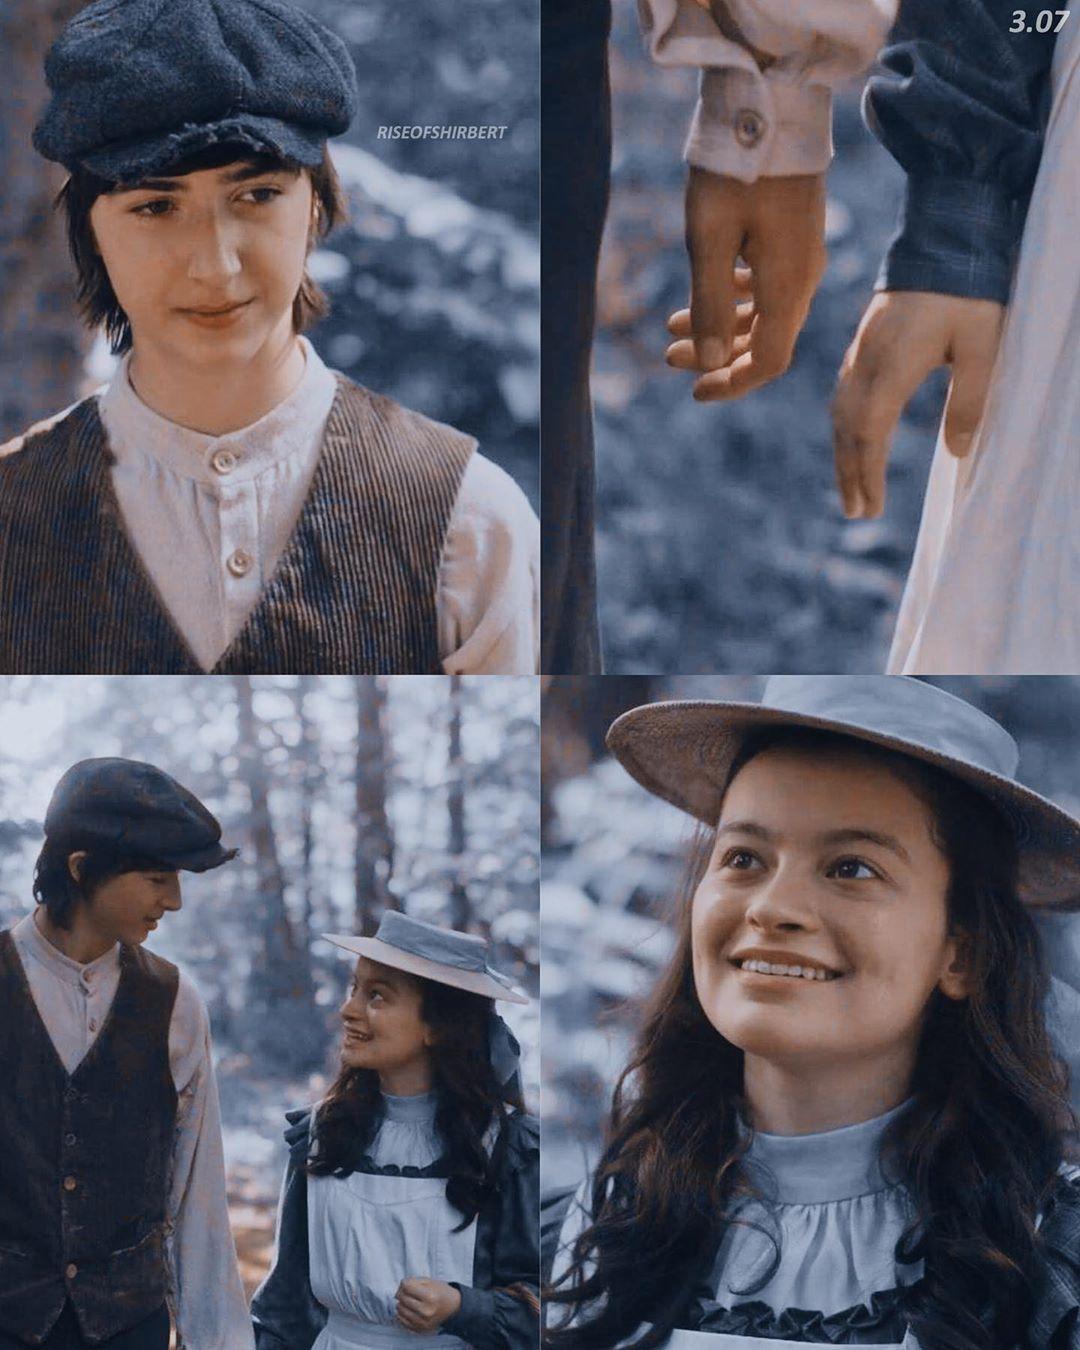 We Need A Season 4 To Save Their Romance Renewannewithane